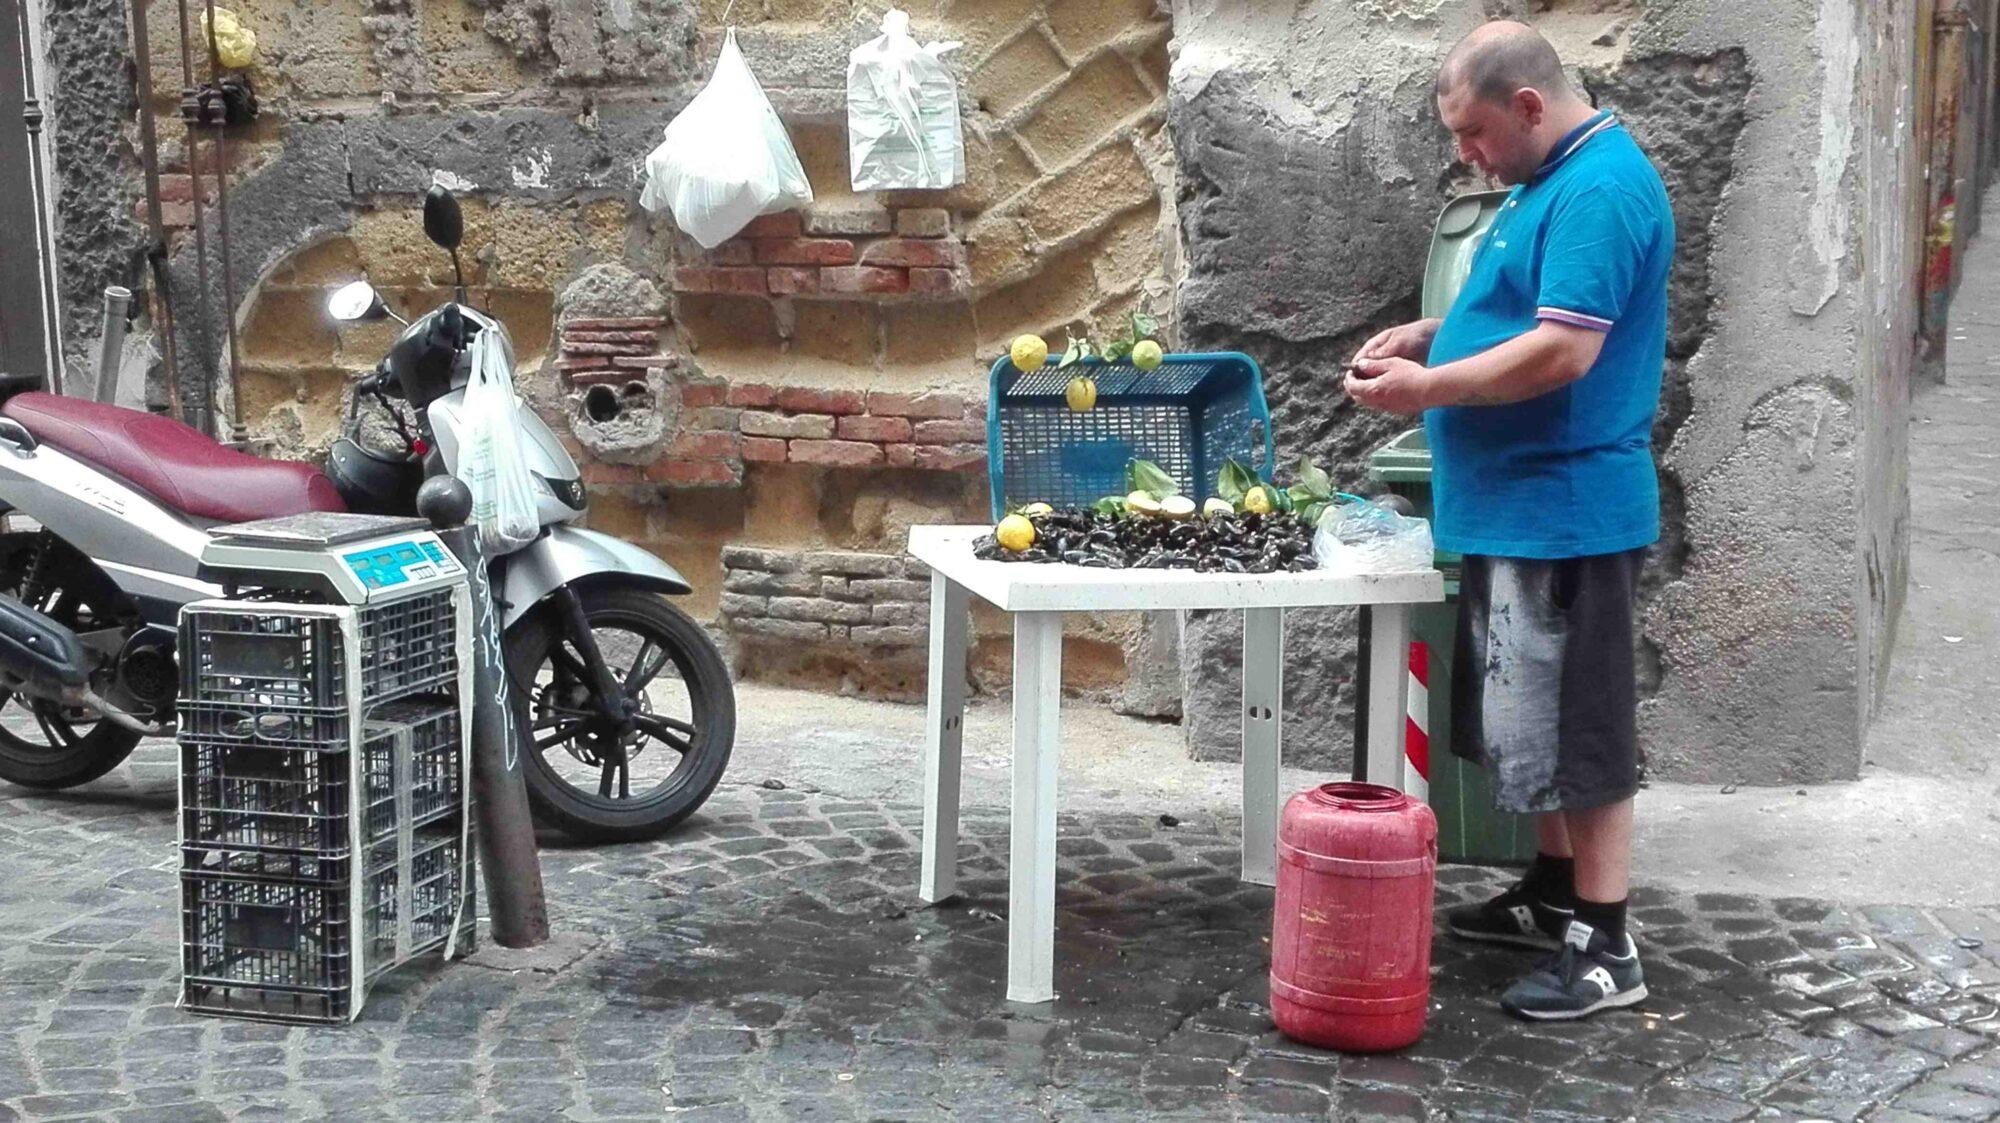 Napoli_cozze